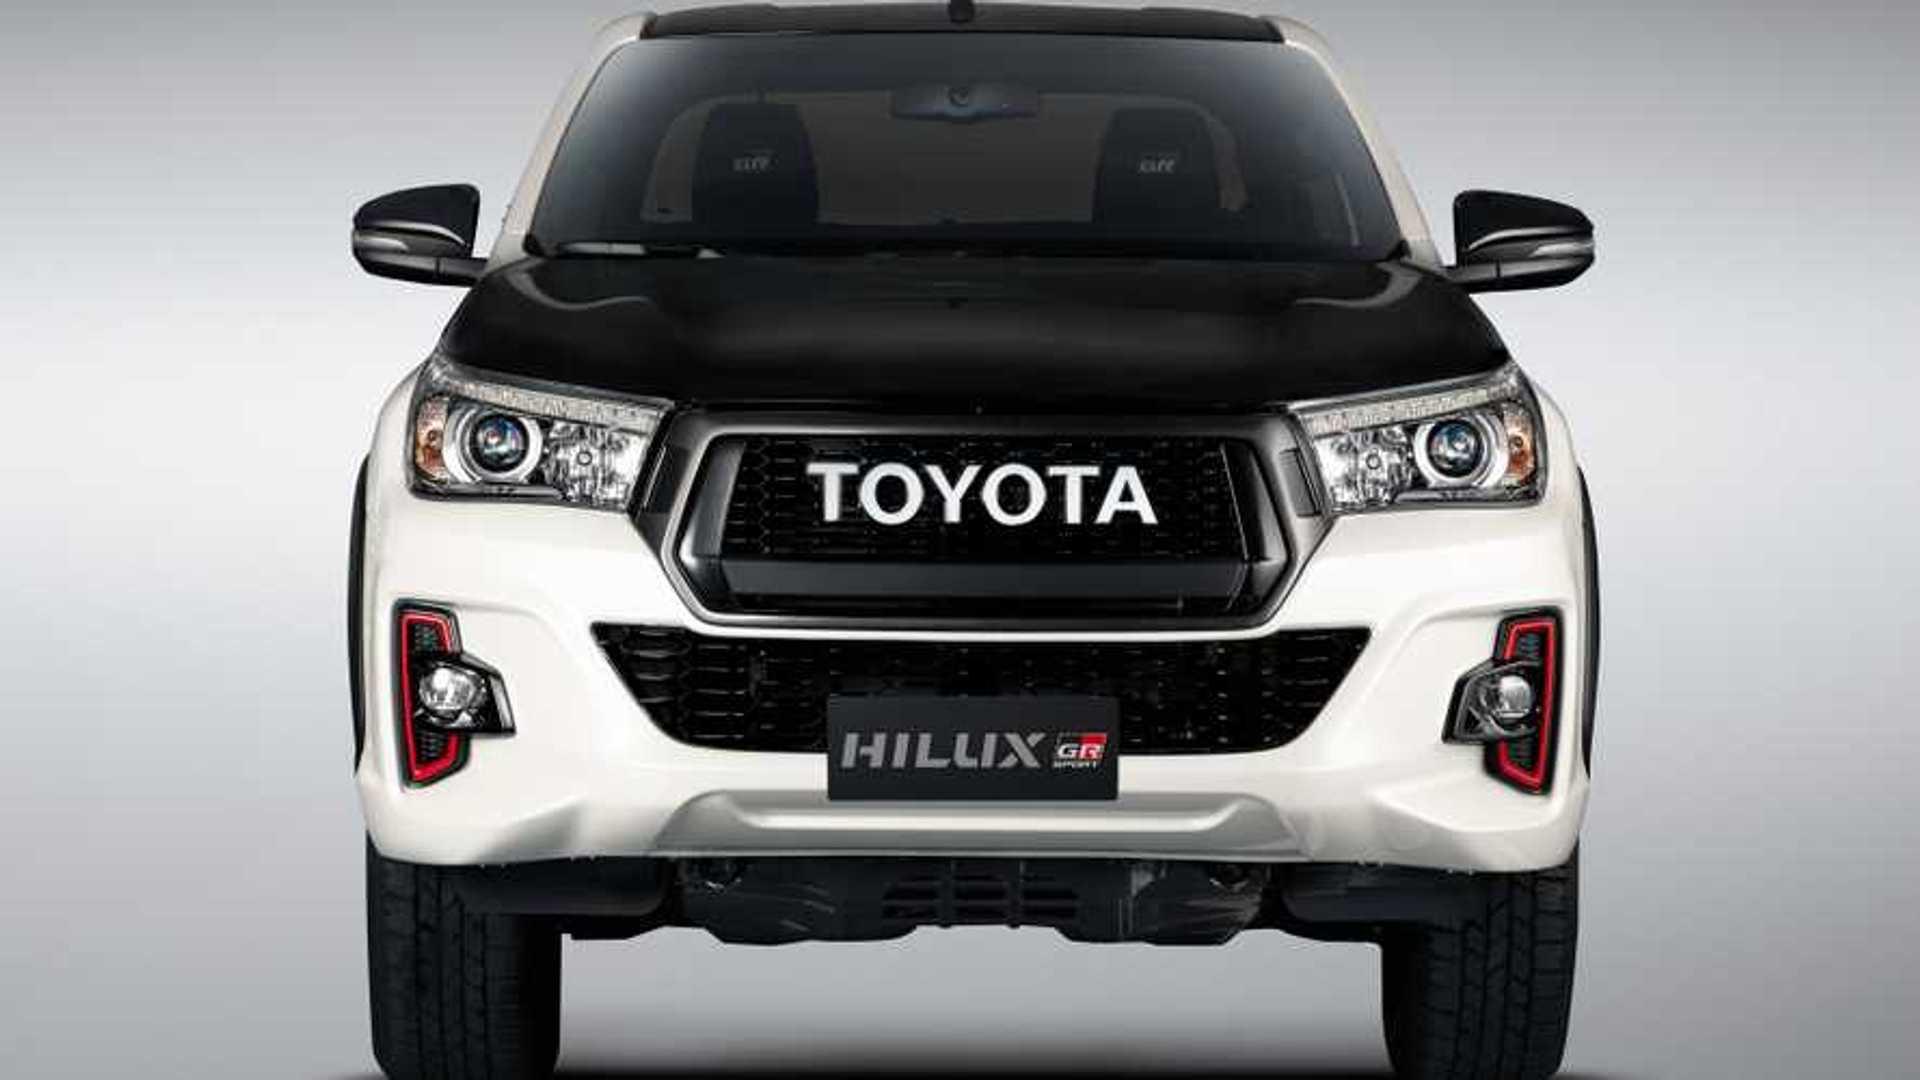 Kelebihan Kekurangan Toyota Ranger Top Model Tahun Ini